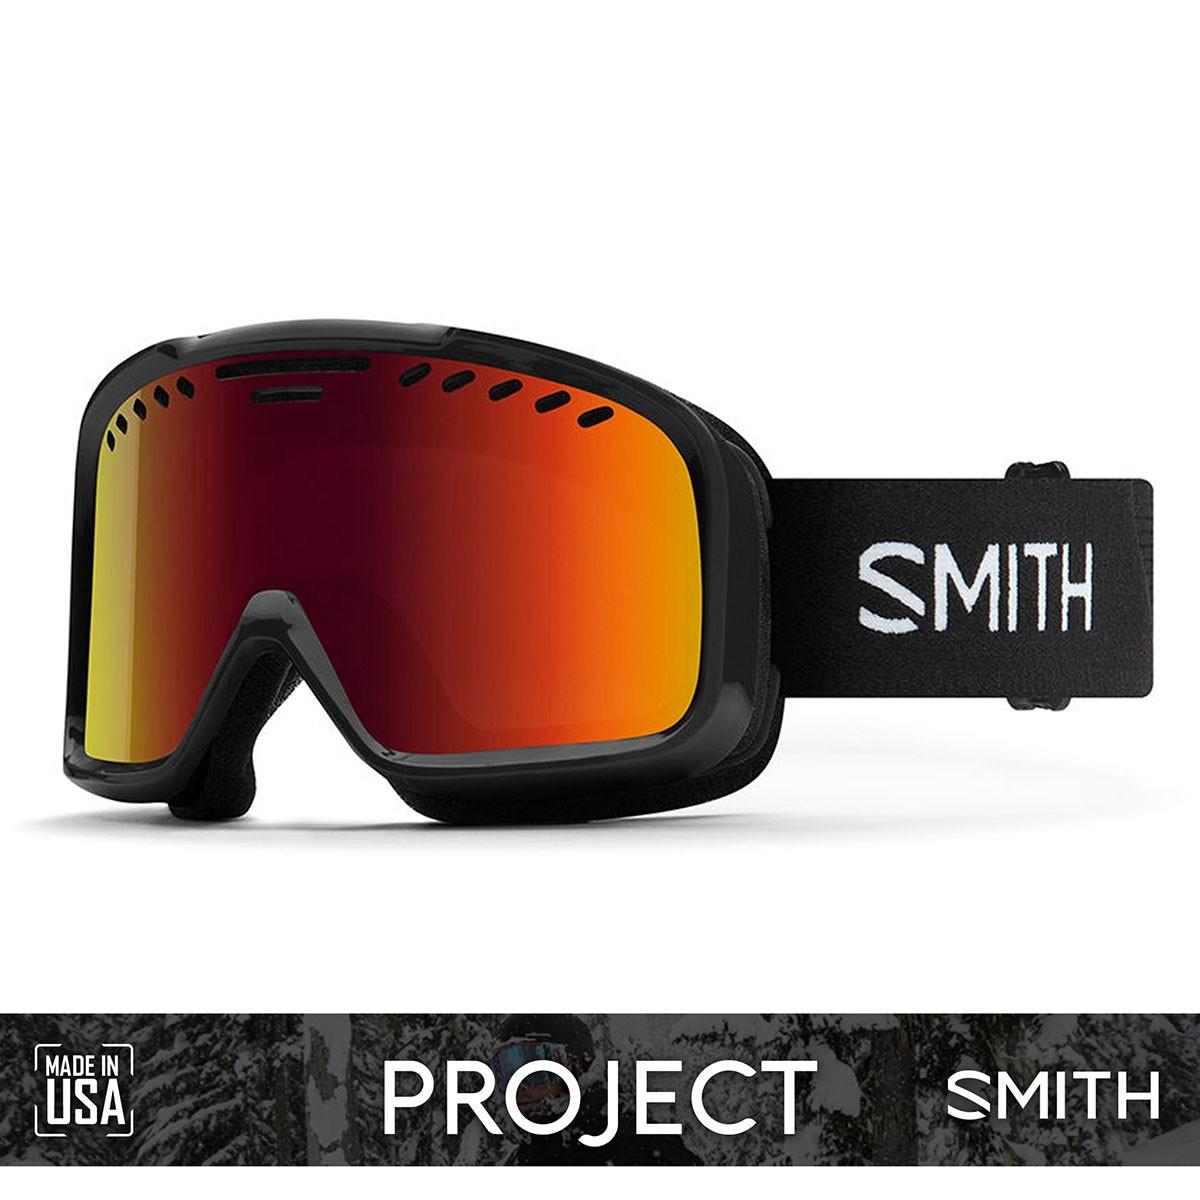 SMITH PROJECT Black | S3 RED SOL-X Mirror - Изображение - AQUAMATRIX